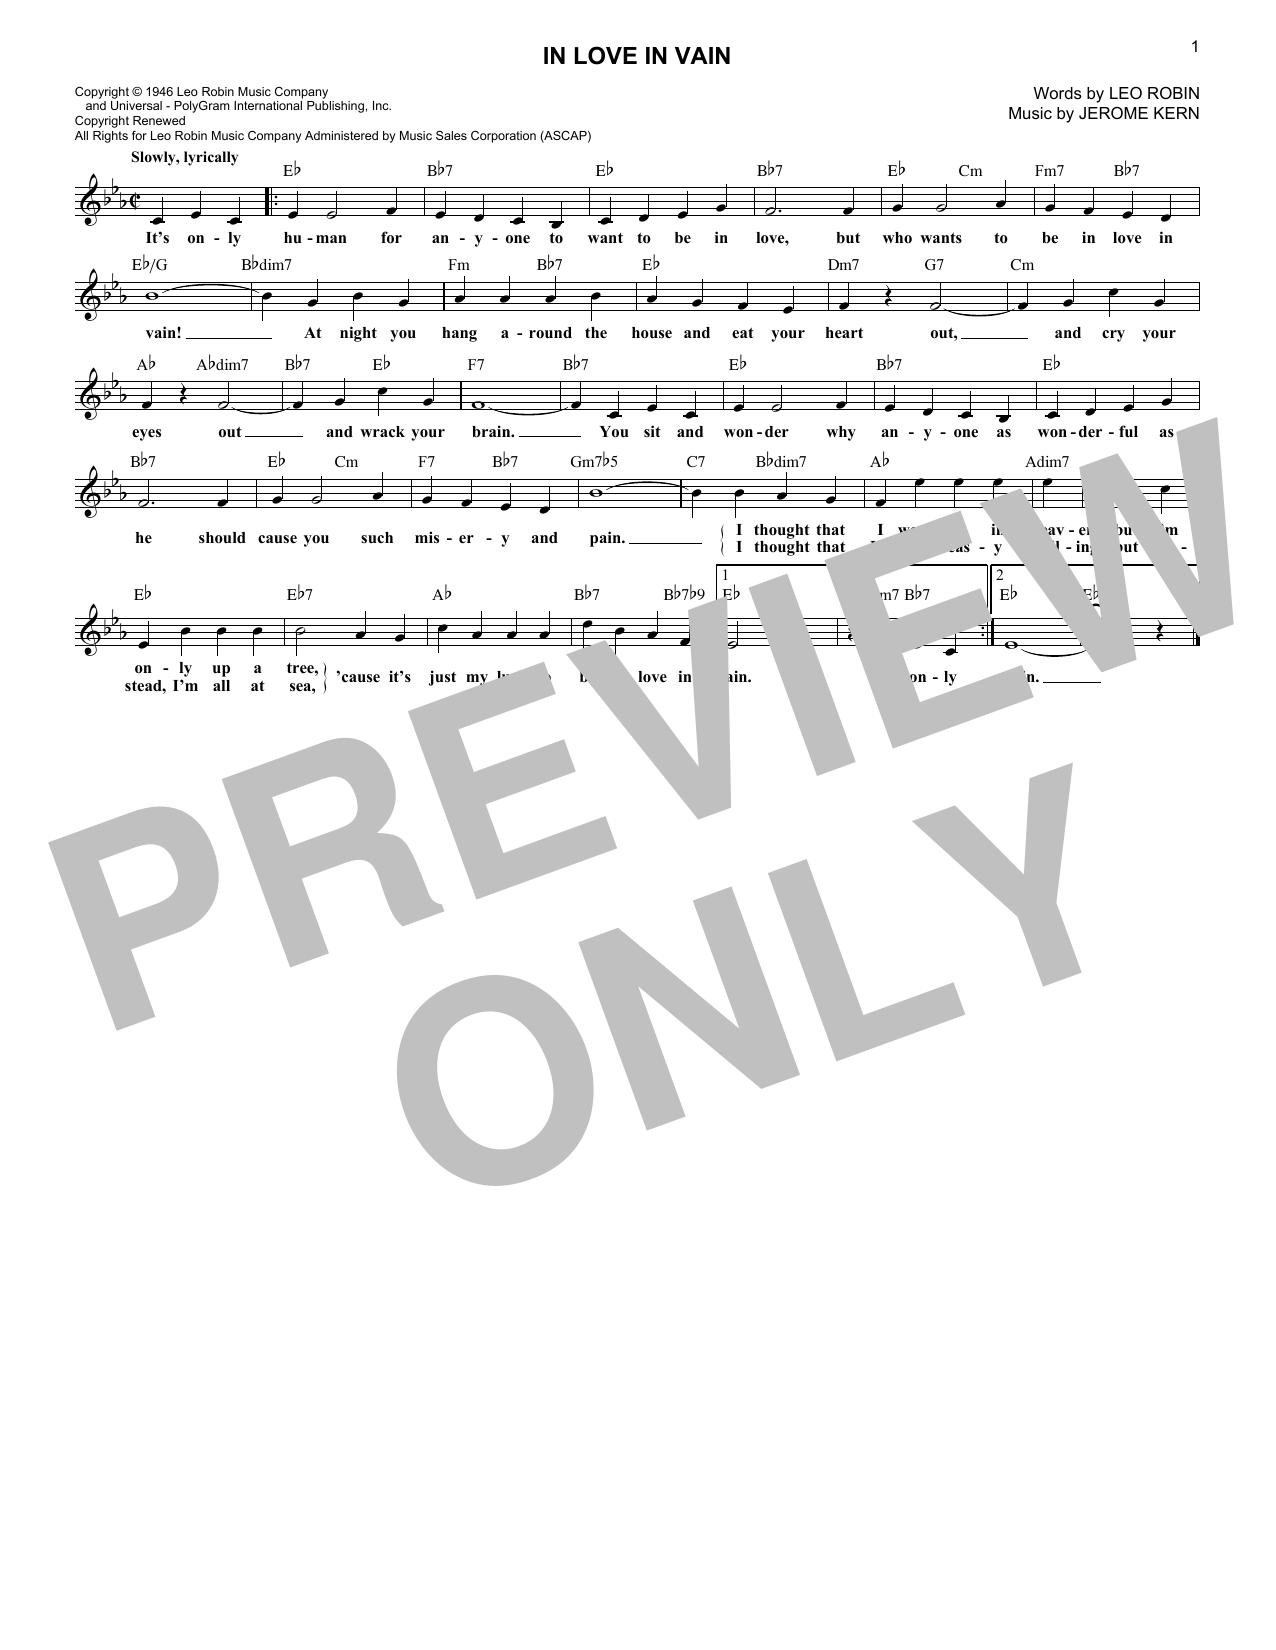 Leo Robin & Jerome Kern In Love In Vain sheet music notes printable PDF score